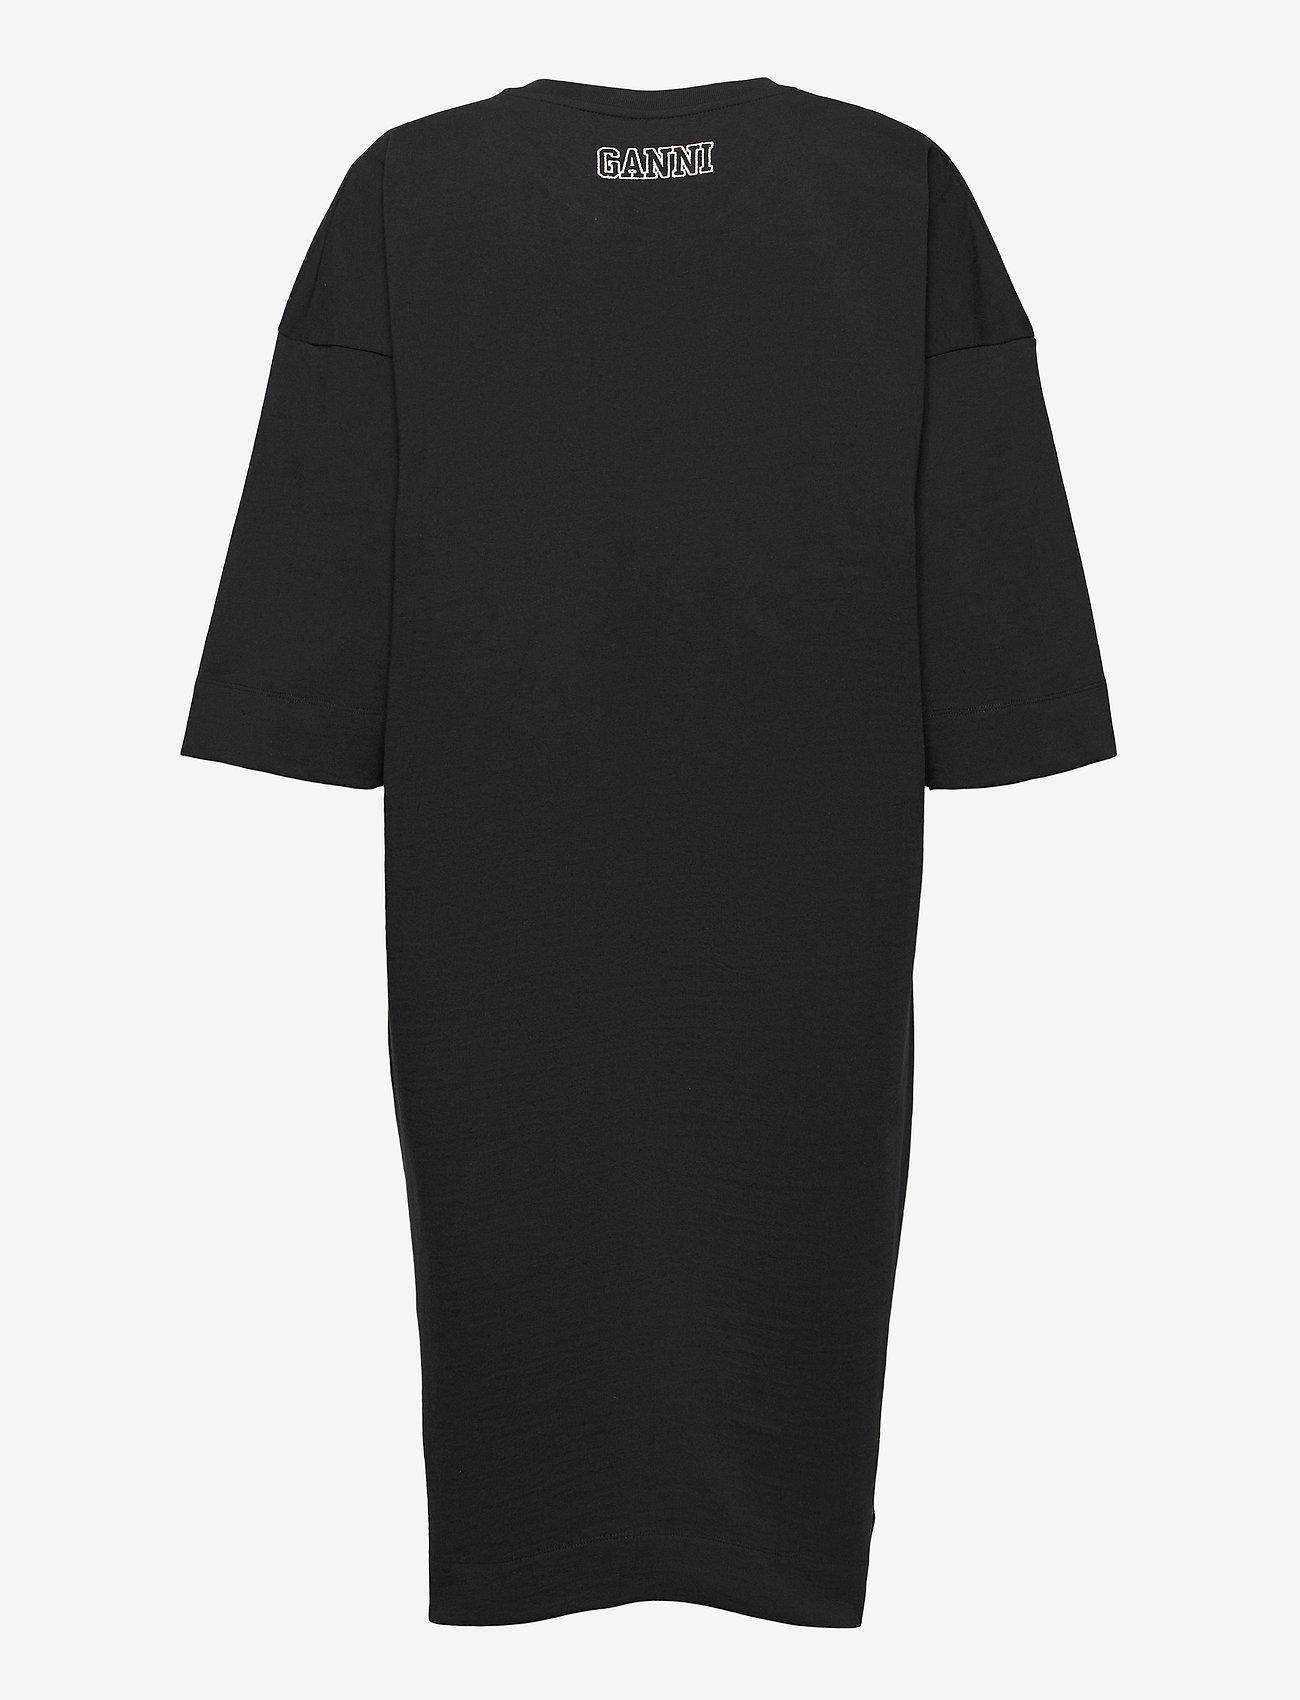 Ganni - Software Jersey - t-shirtkjoler - black - 1